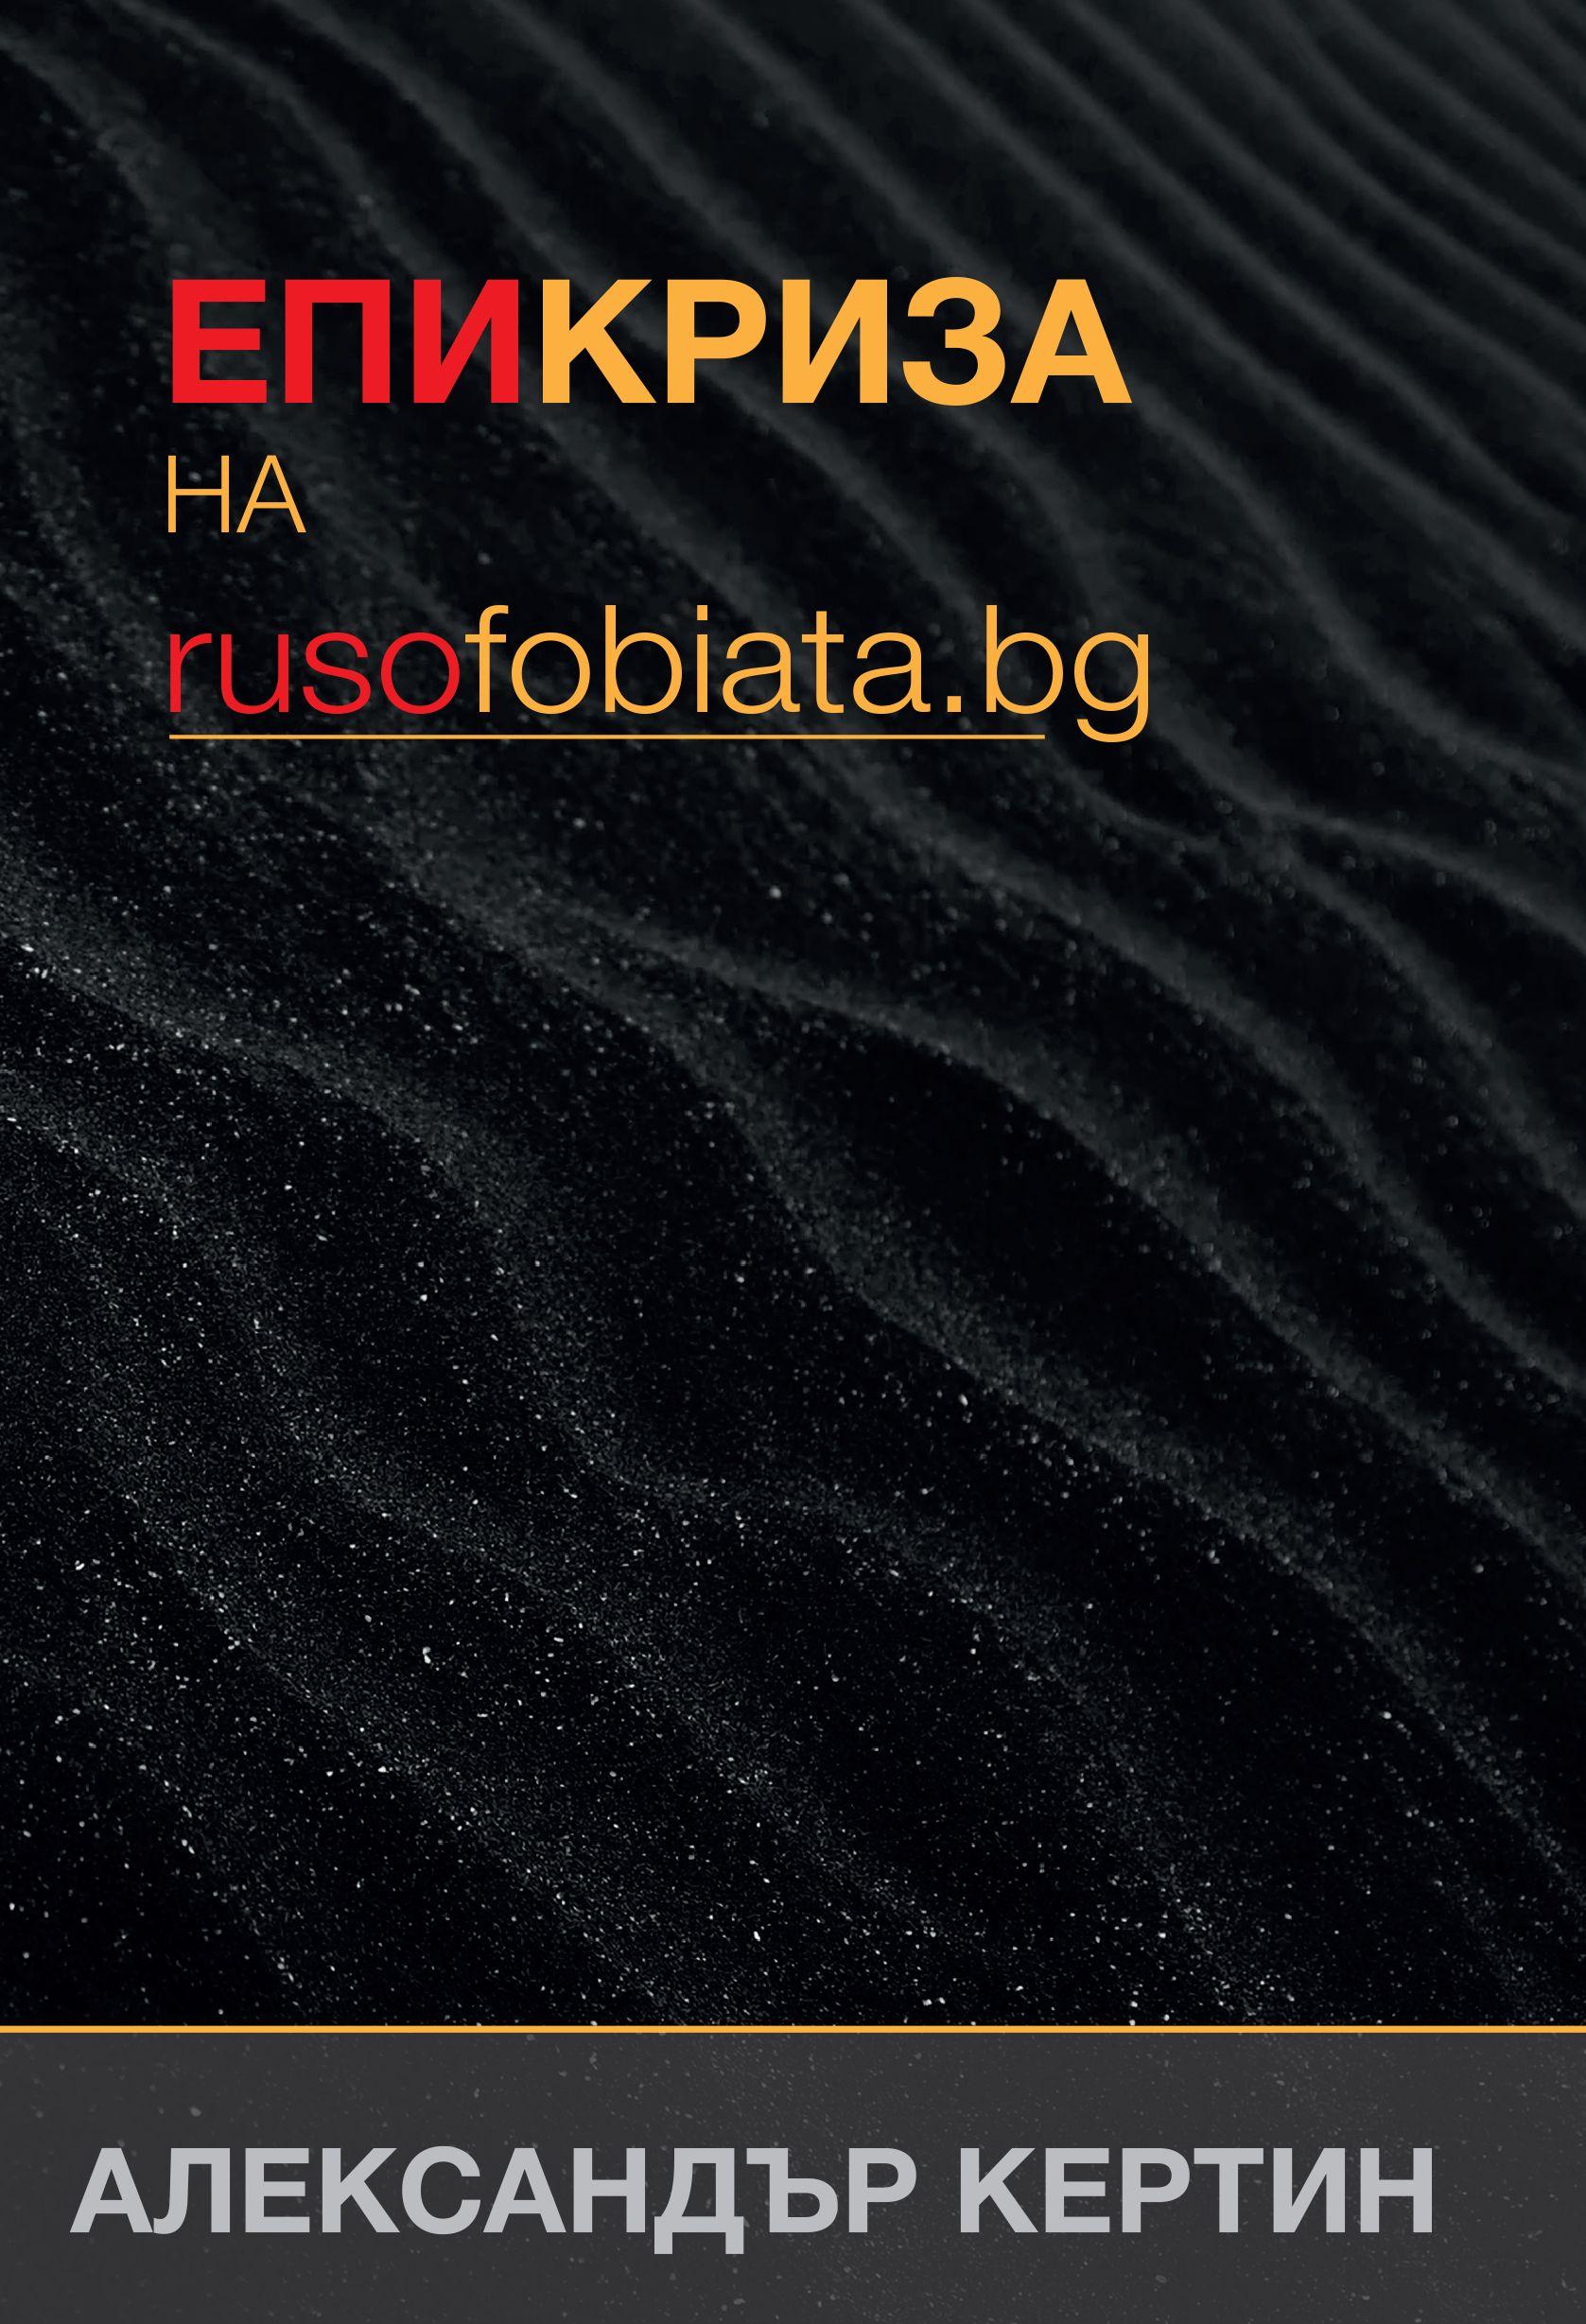 Епикриза на rusofobiata.bg - 1